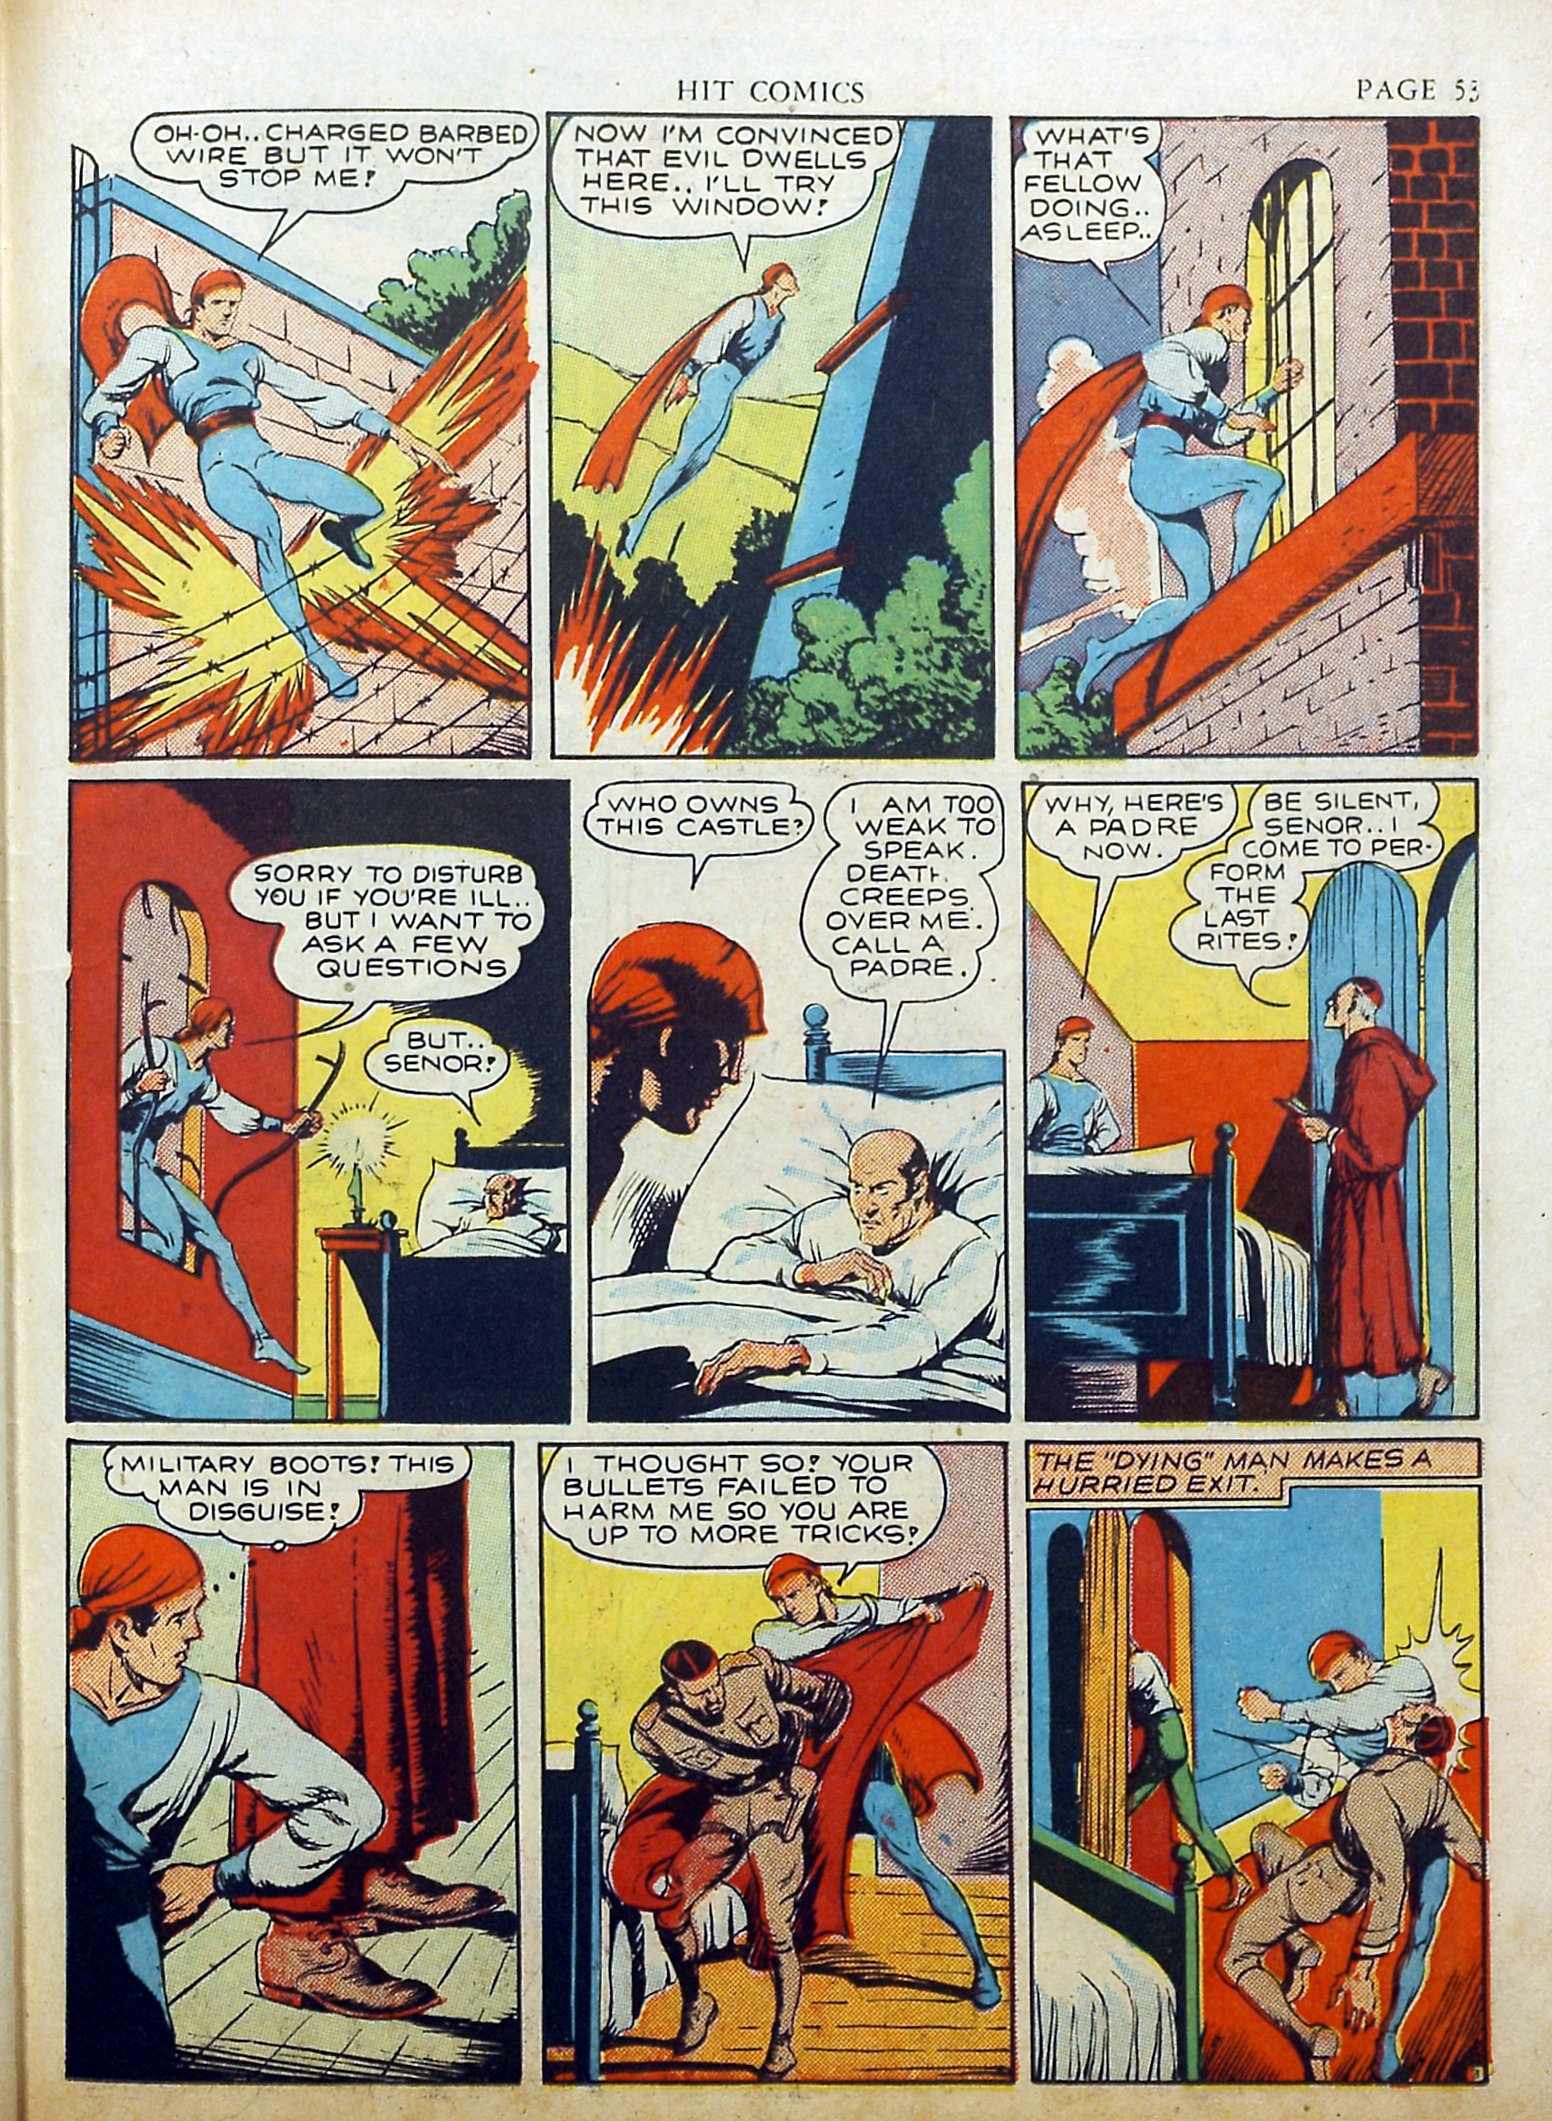 Read online Hit Comics comic -  Issue #17 - 55